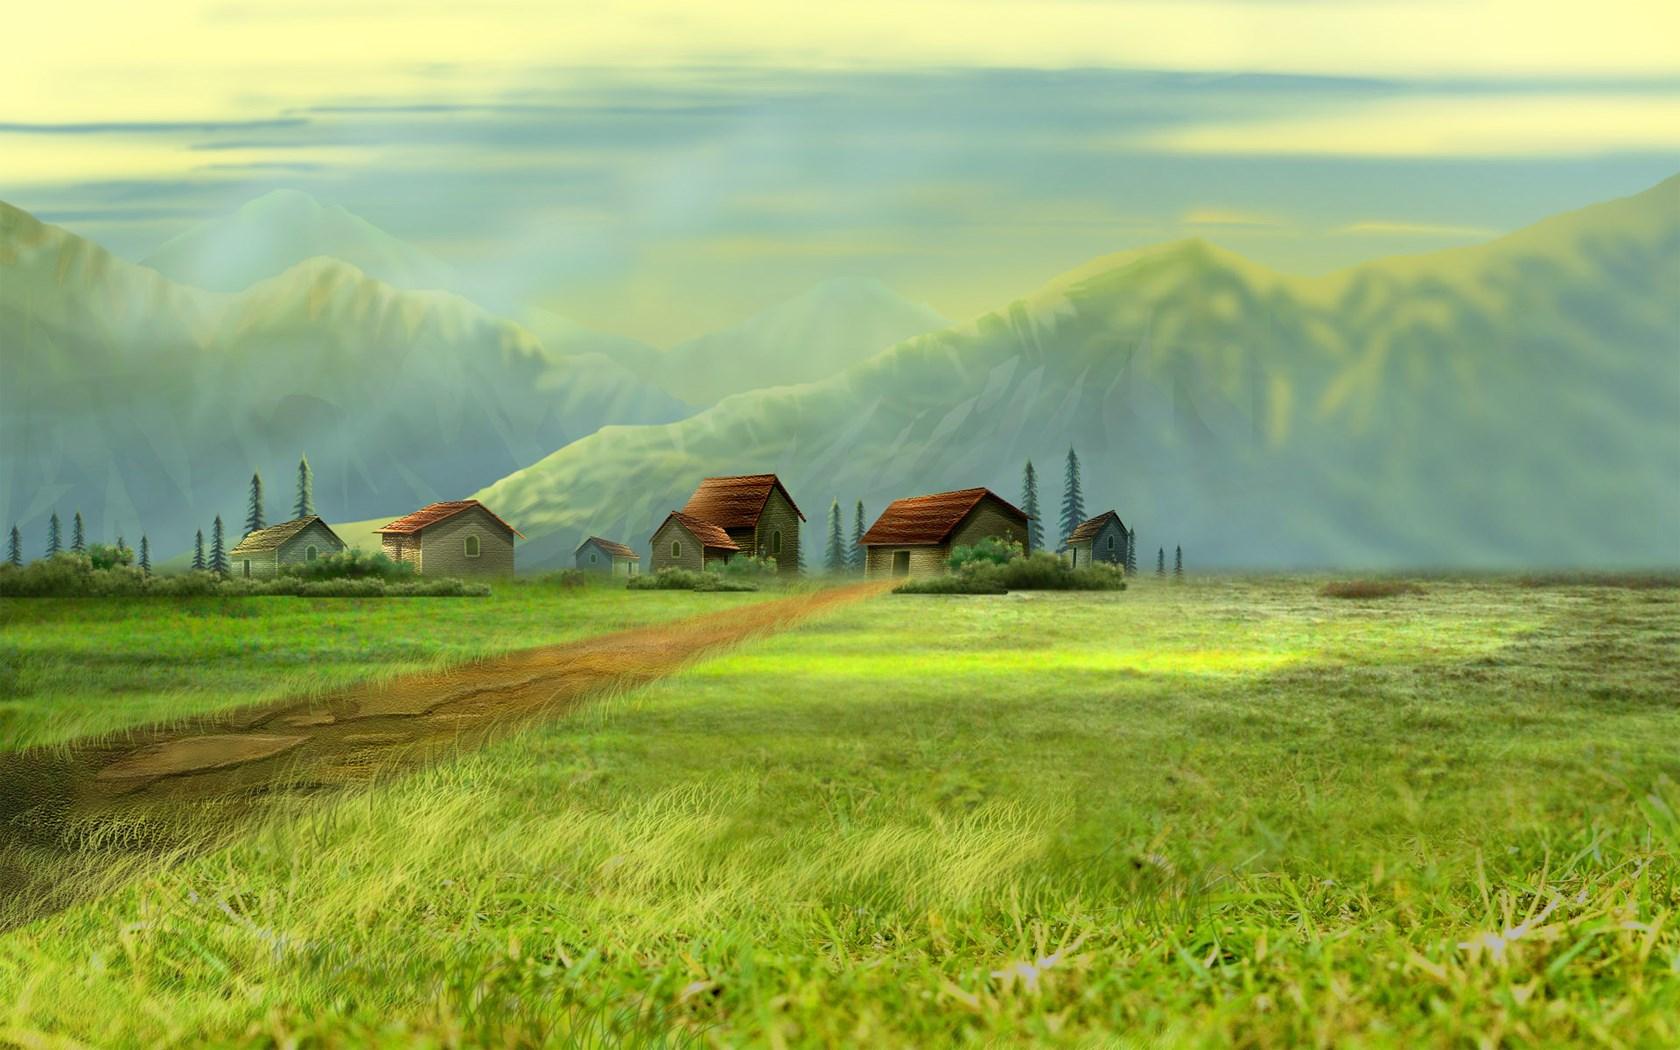 Dream Village Wallpaper [1680x1050] 1680x1050